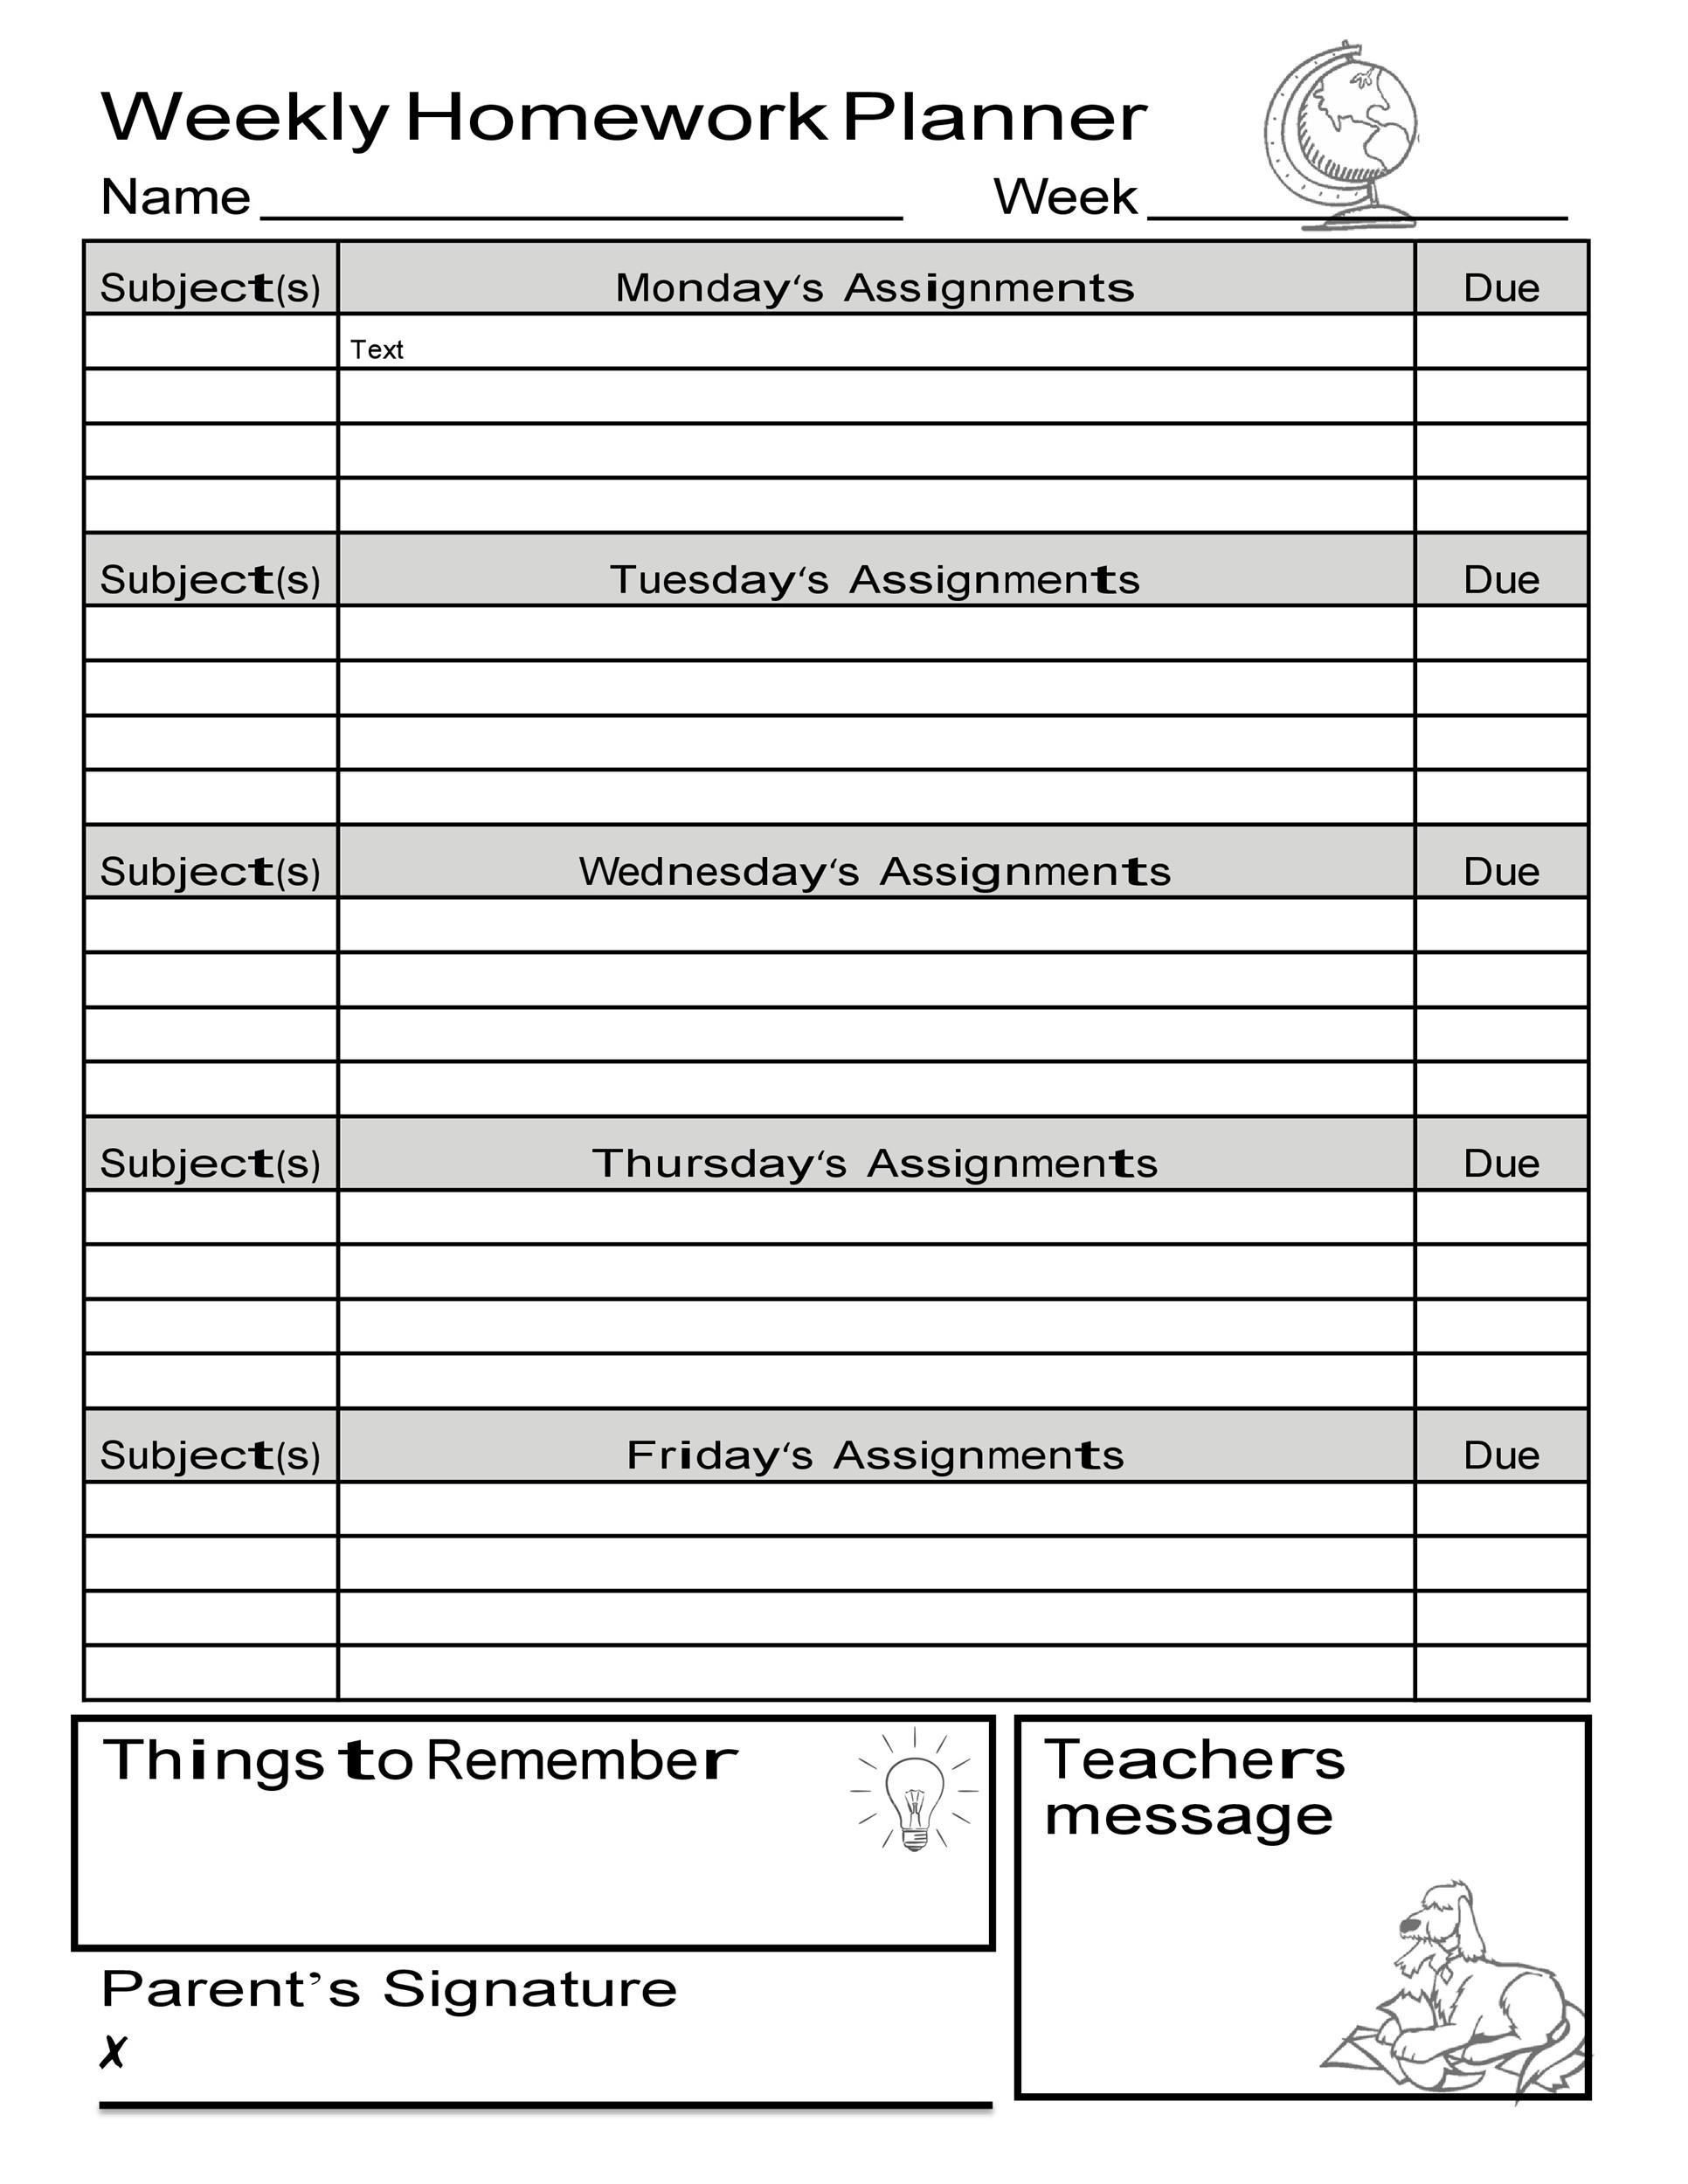 Free homework planner 30